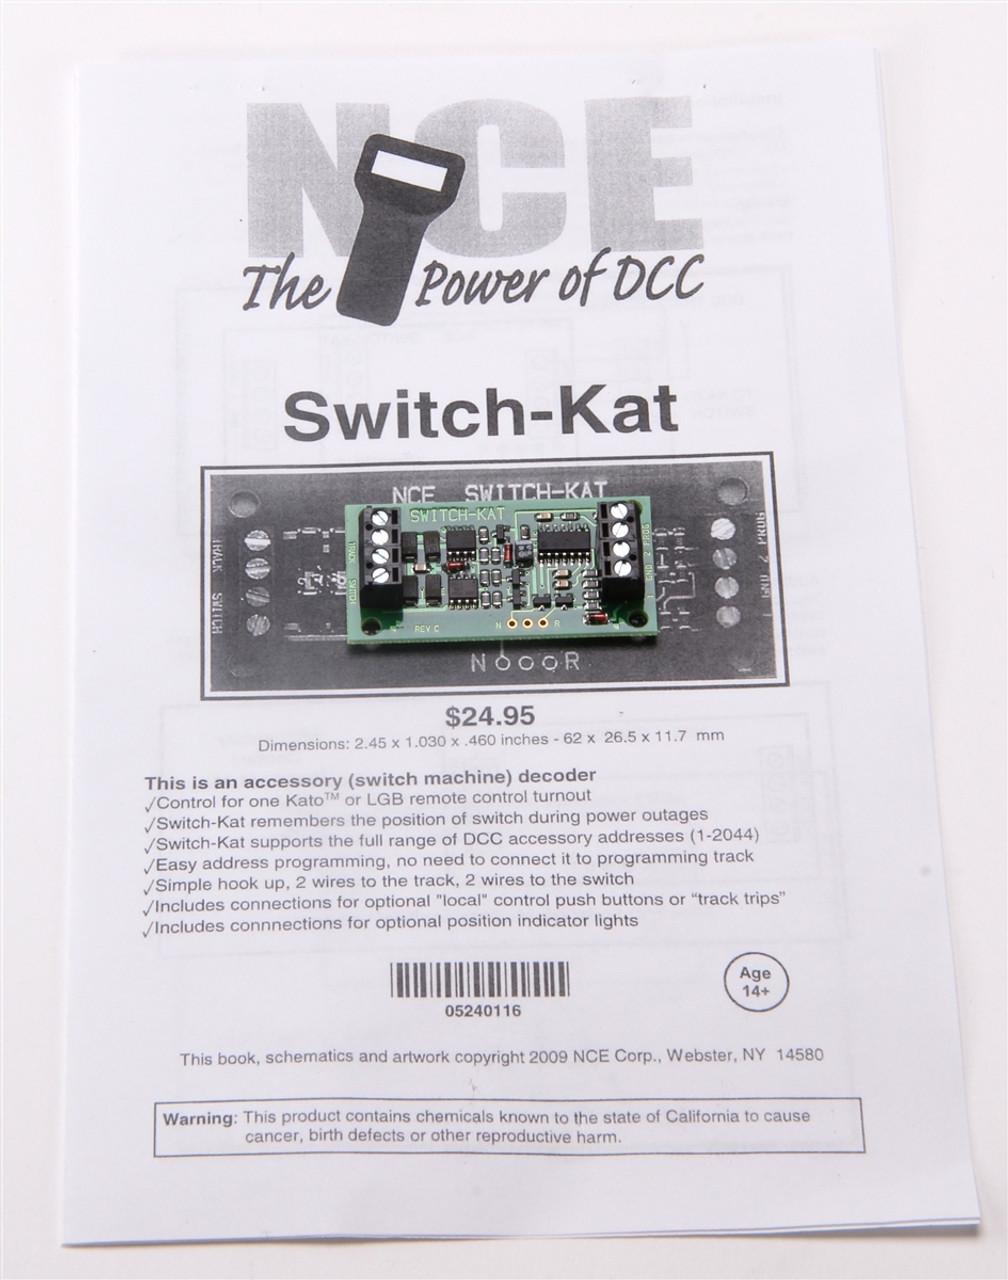 NCE 524116 (Switch-Kat) Accessory Switch Machine Decoder